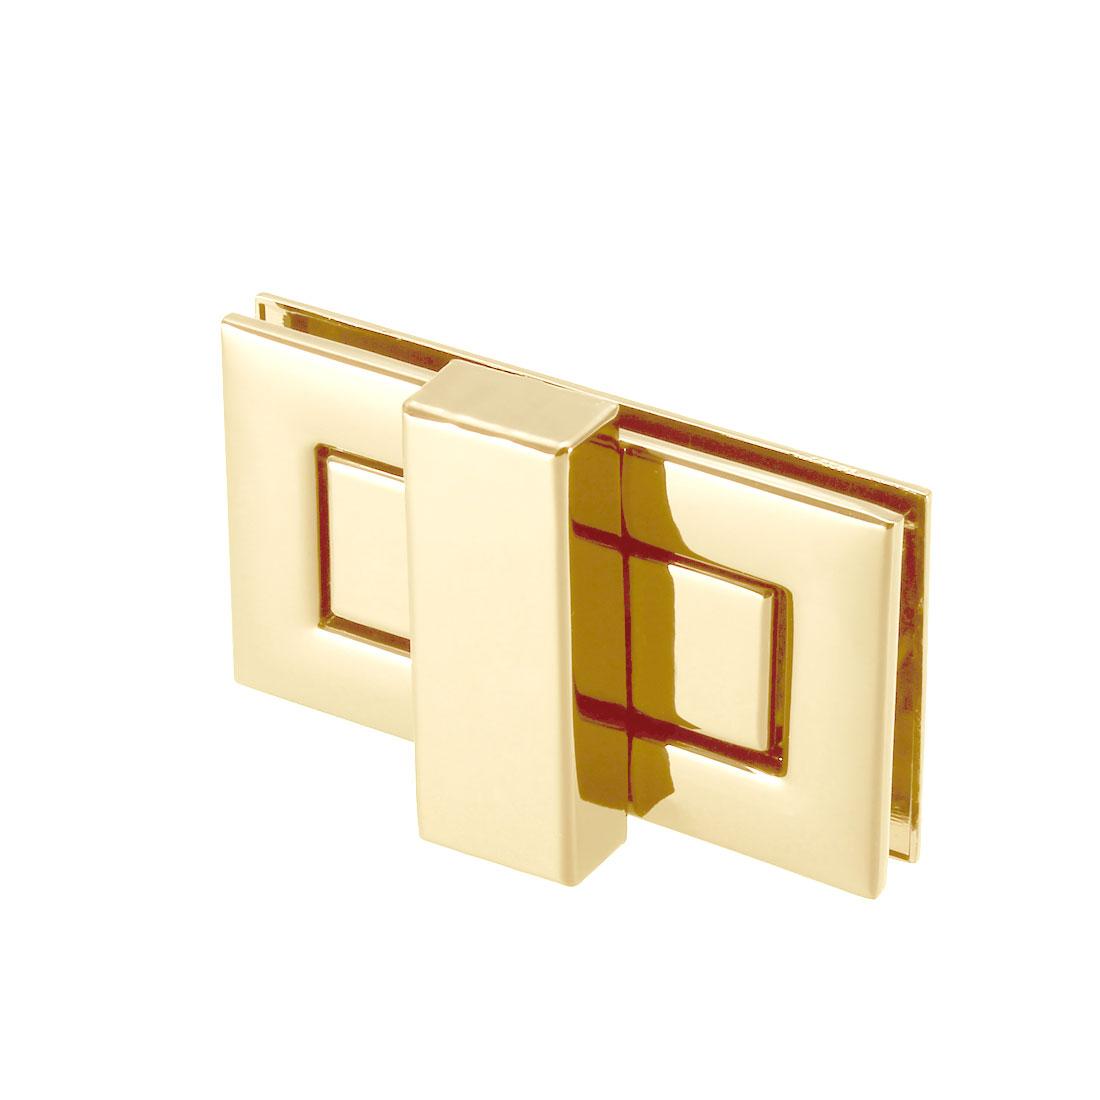 1 Set Rectangular Purses Twist Lock 52mm x 29mm Clutches Closures - Light Gold